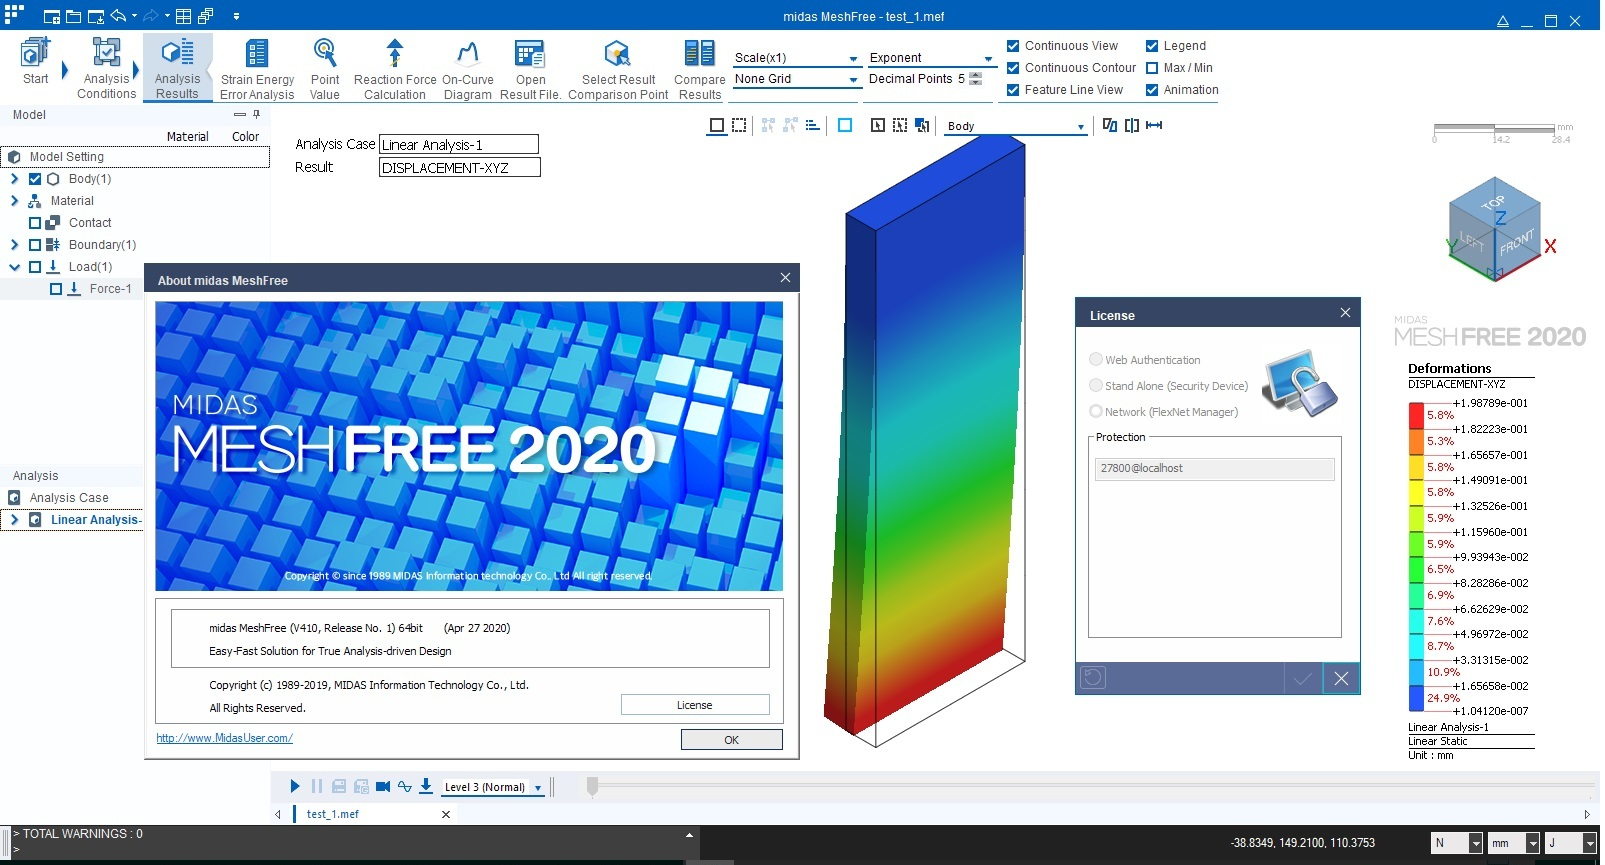 Working with midas MeshFree 2020 R1 full license